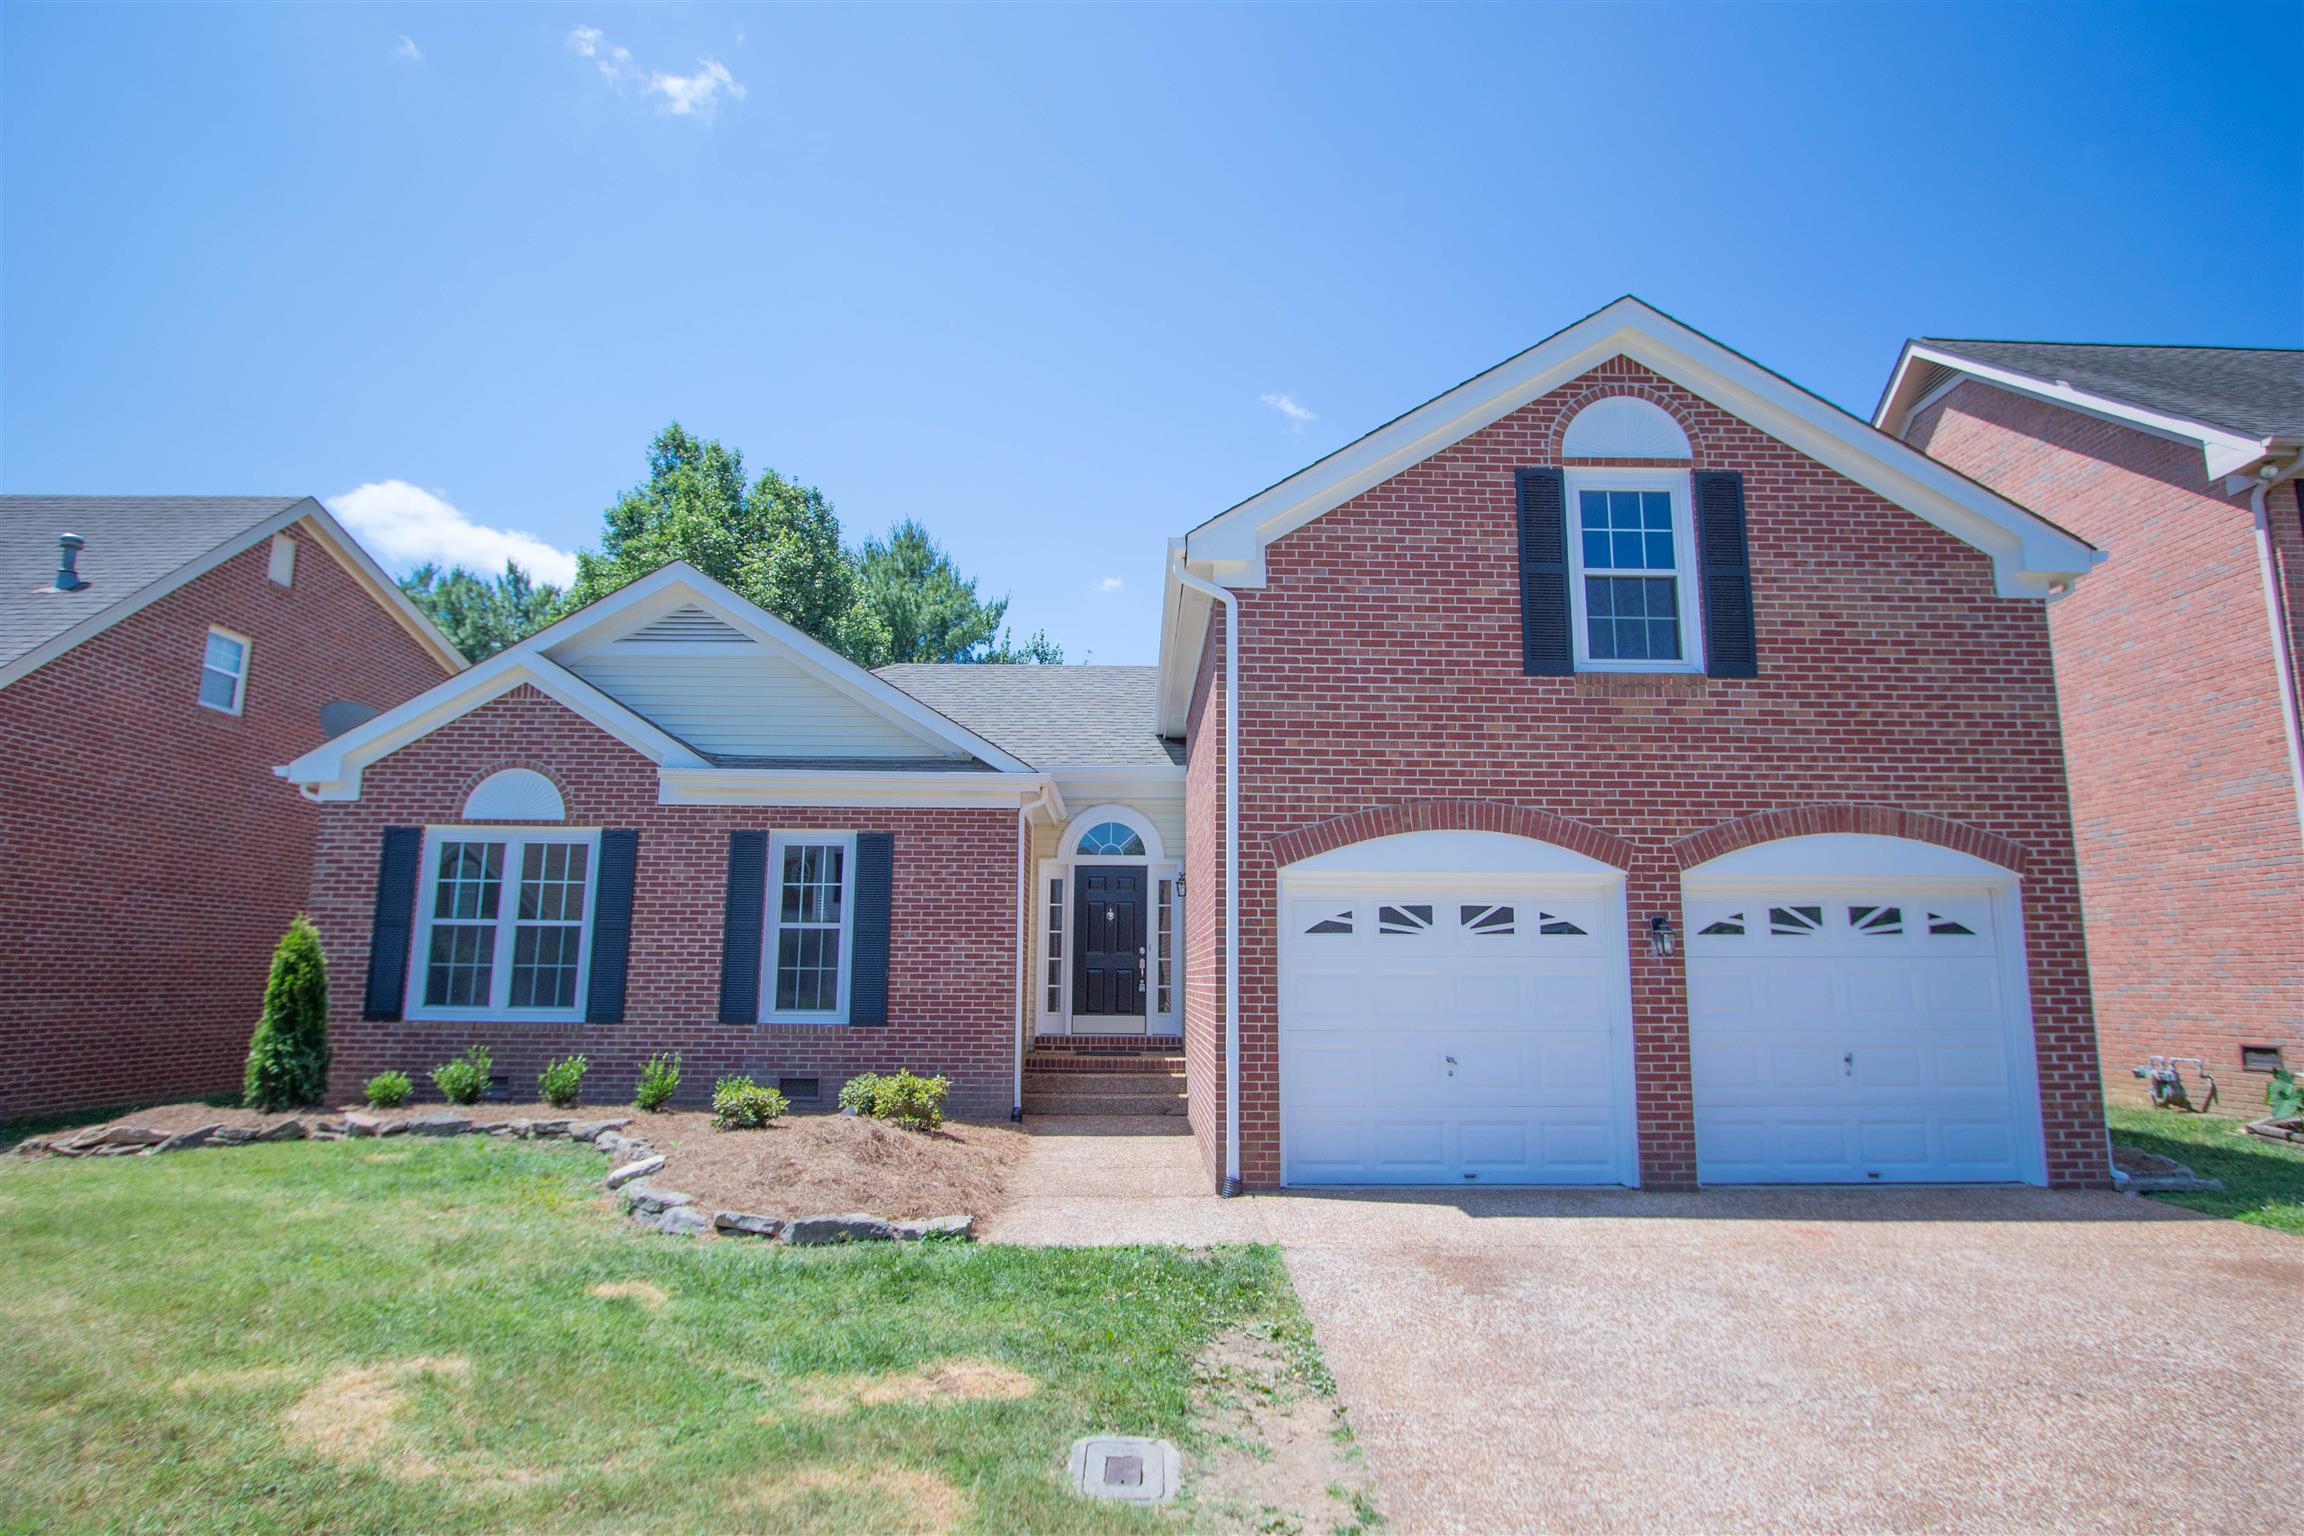 176 Crestfield Pl, Franklin, TN 37069 - Franklin, TN real estate listing